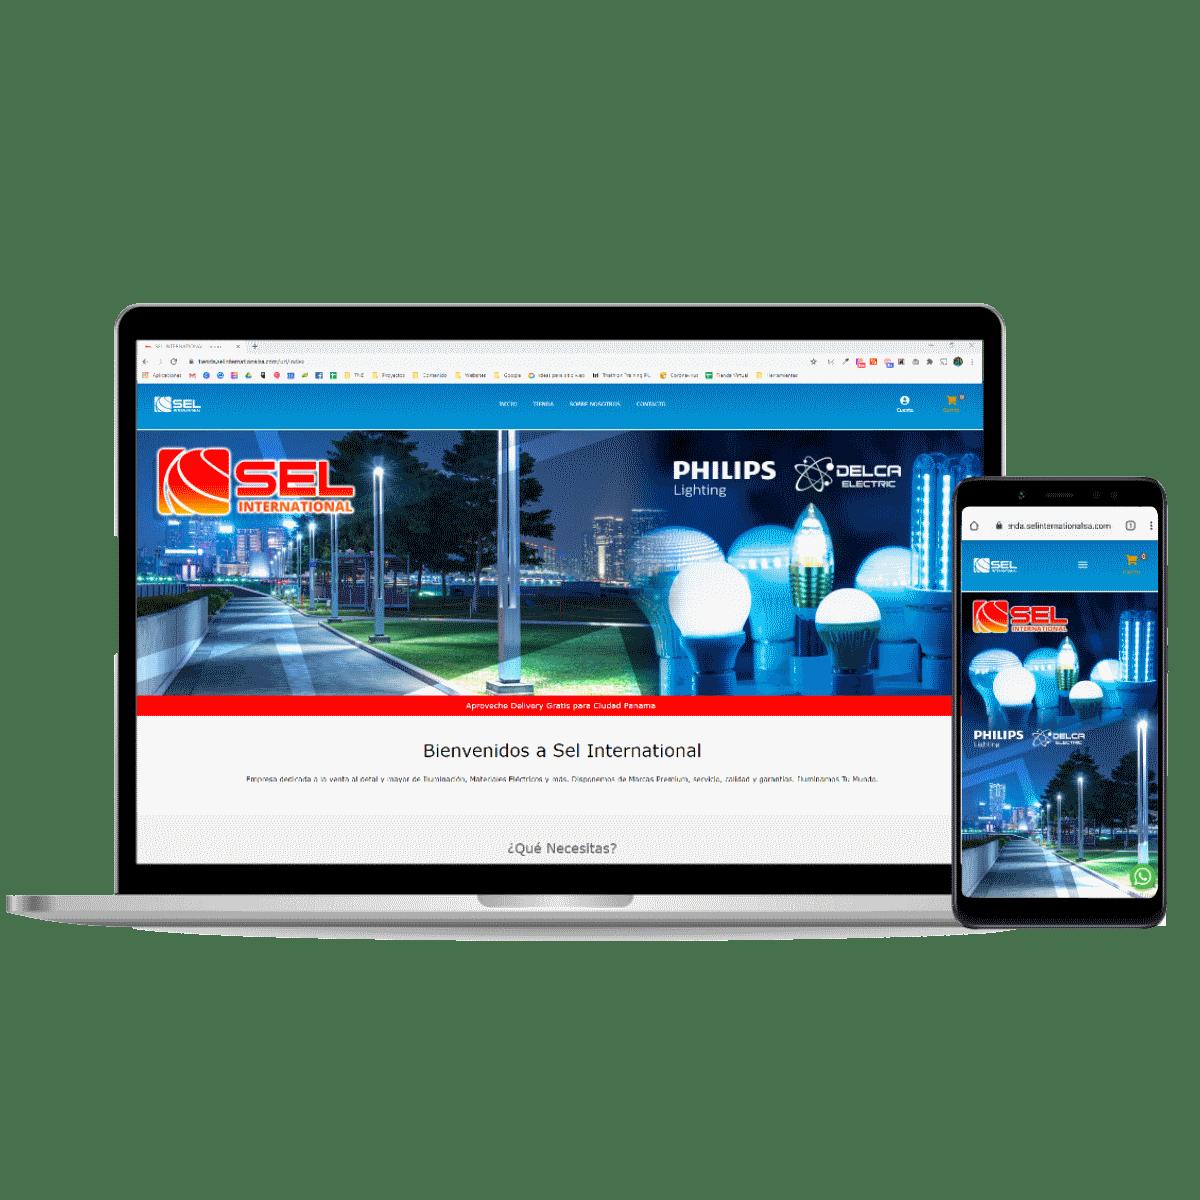 Tienda online Sel International